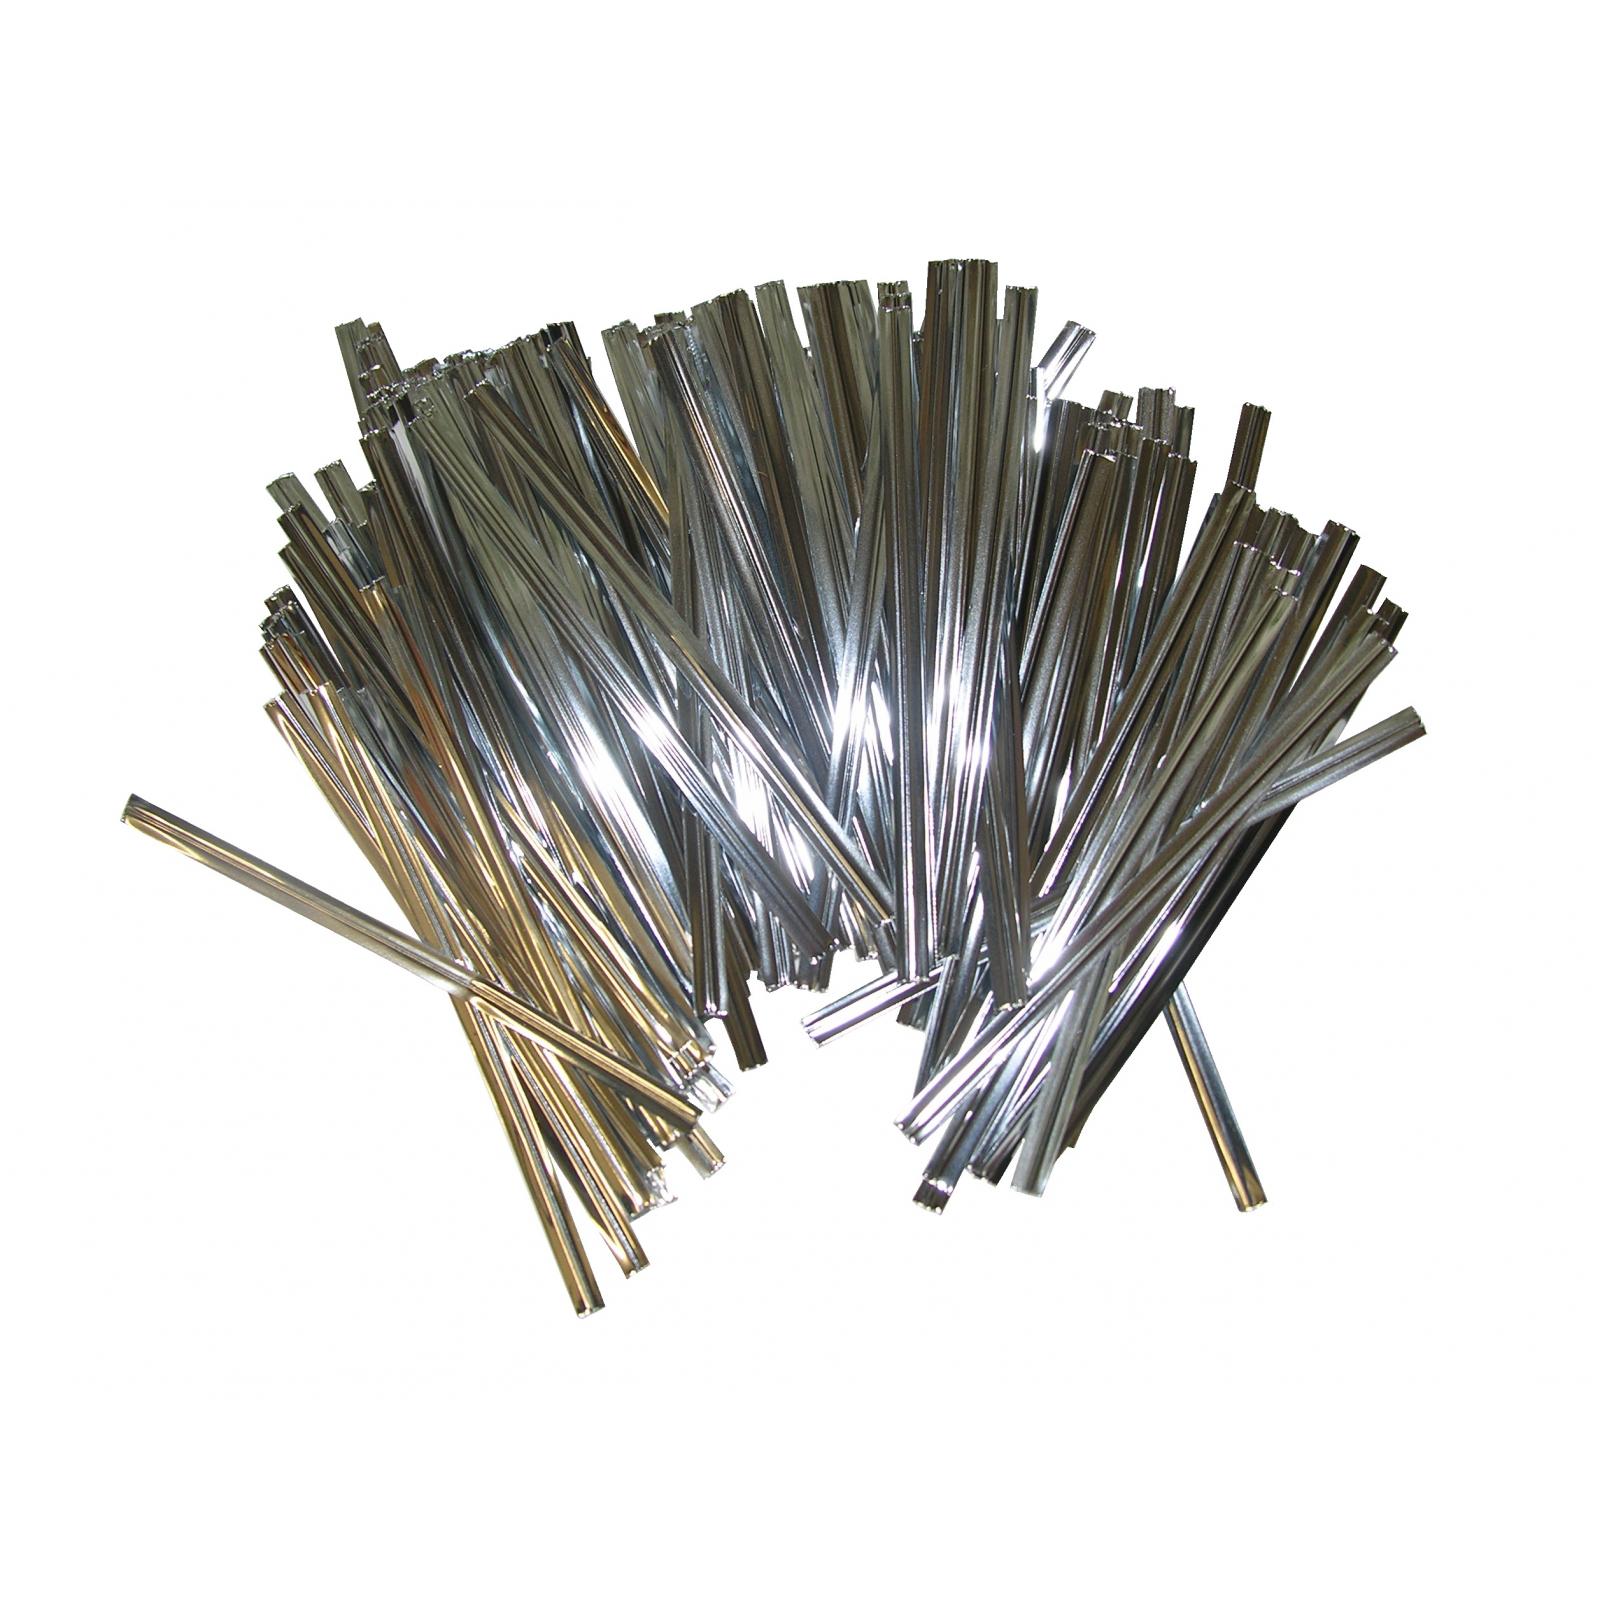 800 mini binder bindedraht verschluss f r gefrierbeutel kabel draht basteldrah ebay. Black Bedroom Furniture Sets. Home Design Ideas